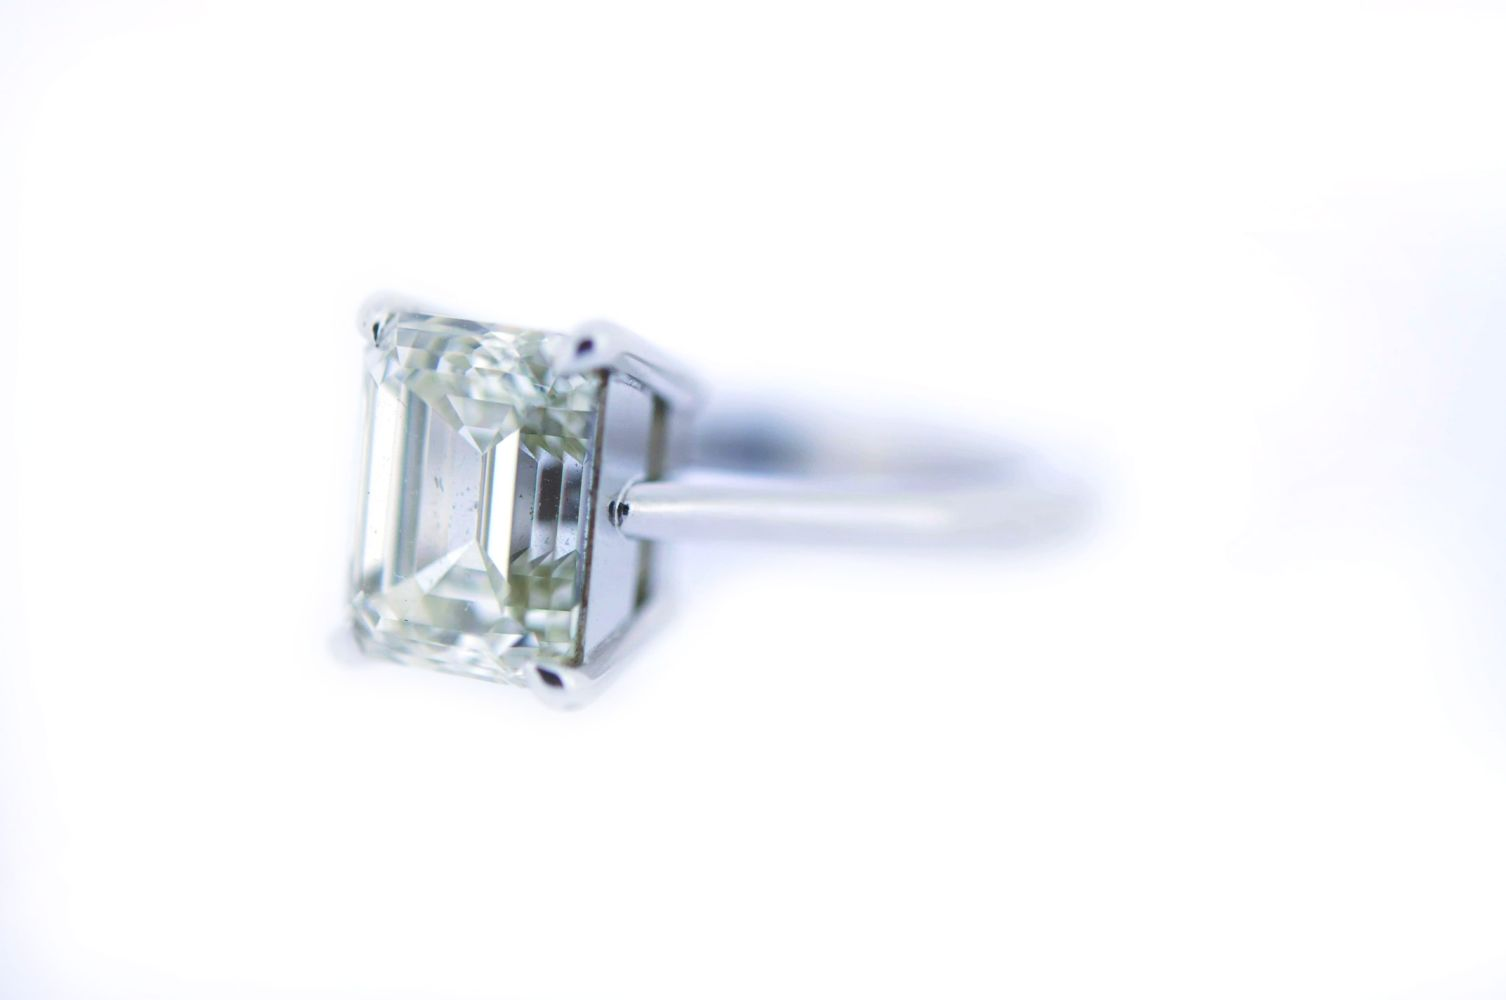 #17 Diamond Solitaire, Emerald Cut, 5 ct | Diamant-Solitär, Emerald Cut, 5 ct Image